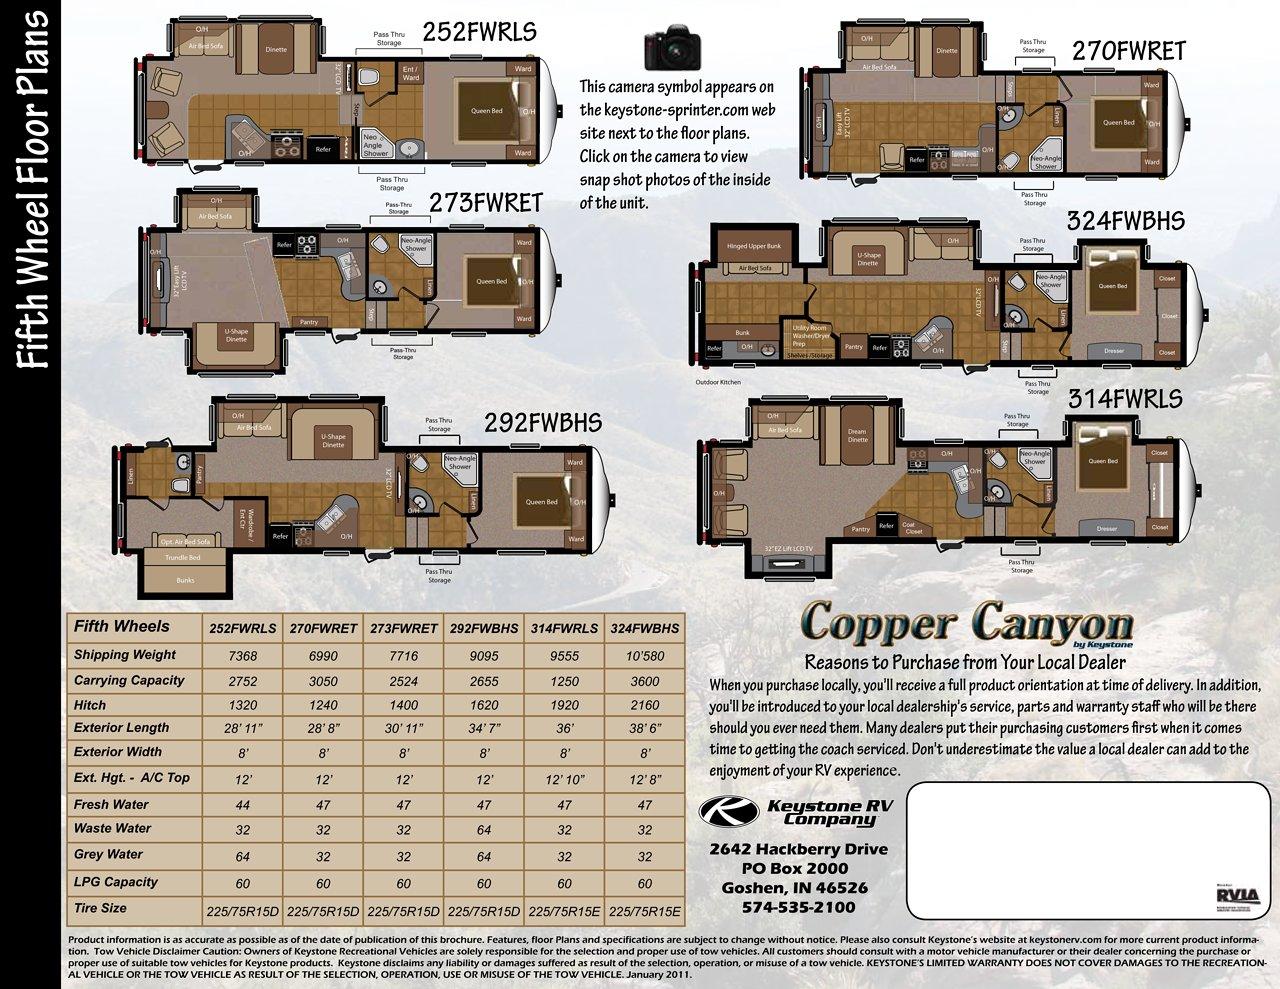 2011 Keystone Rv Sprinter Copper Canyon Brochure Download Rv Brochures